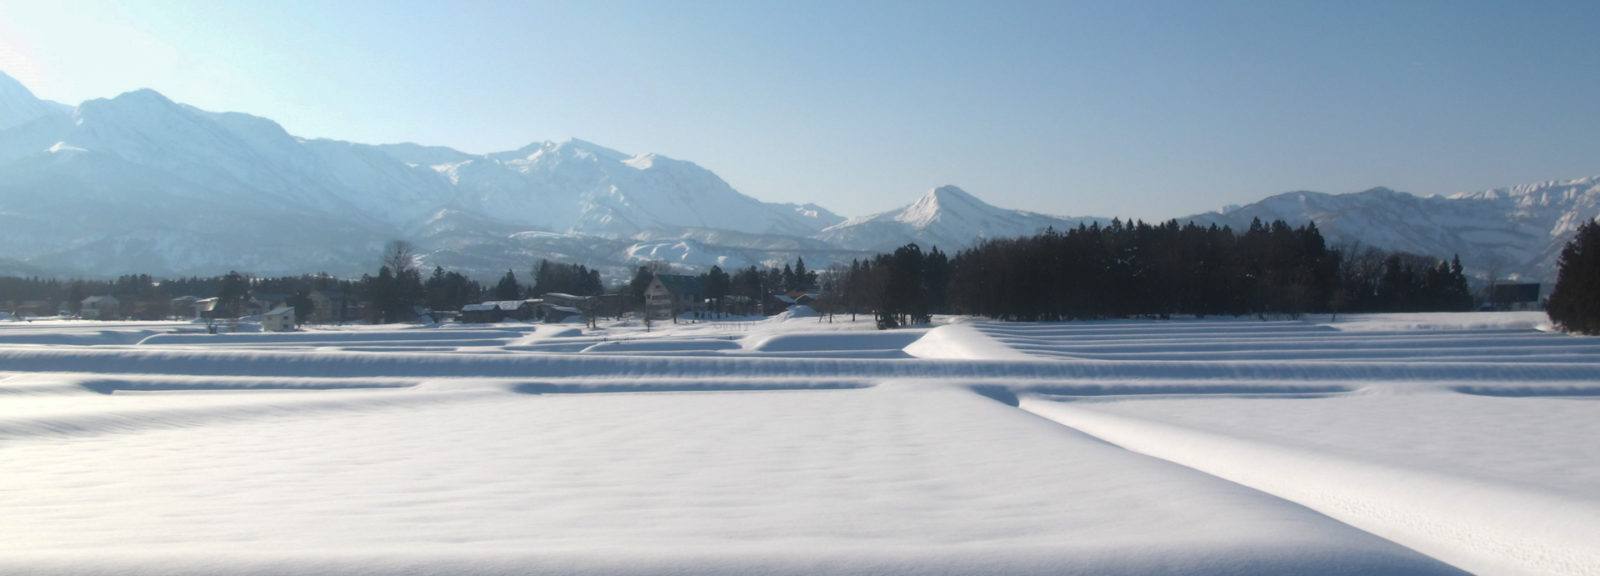 Session d'hiver